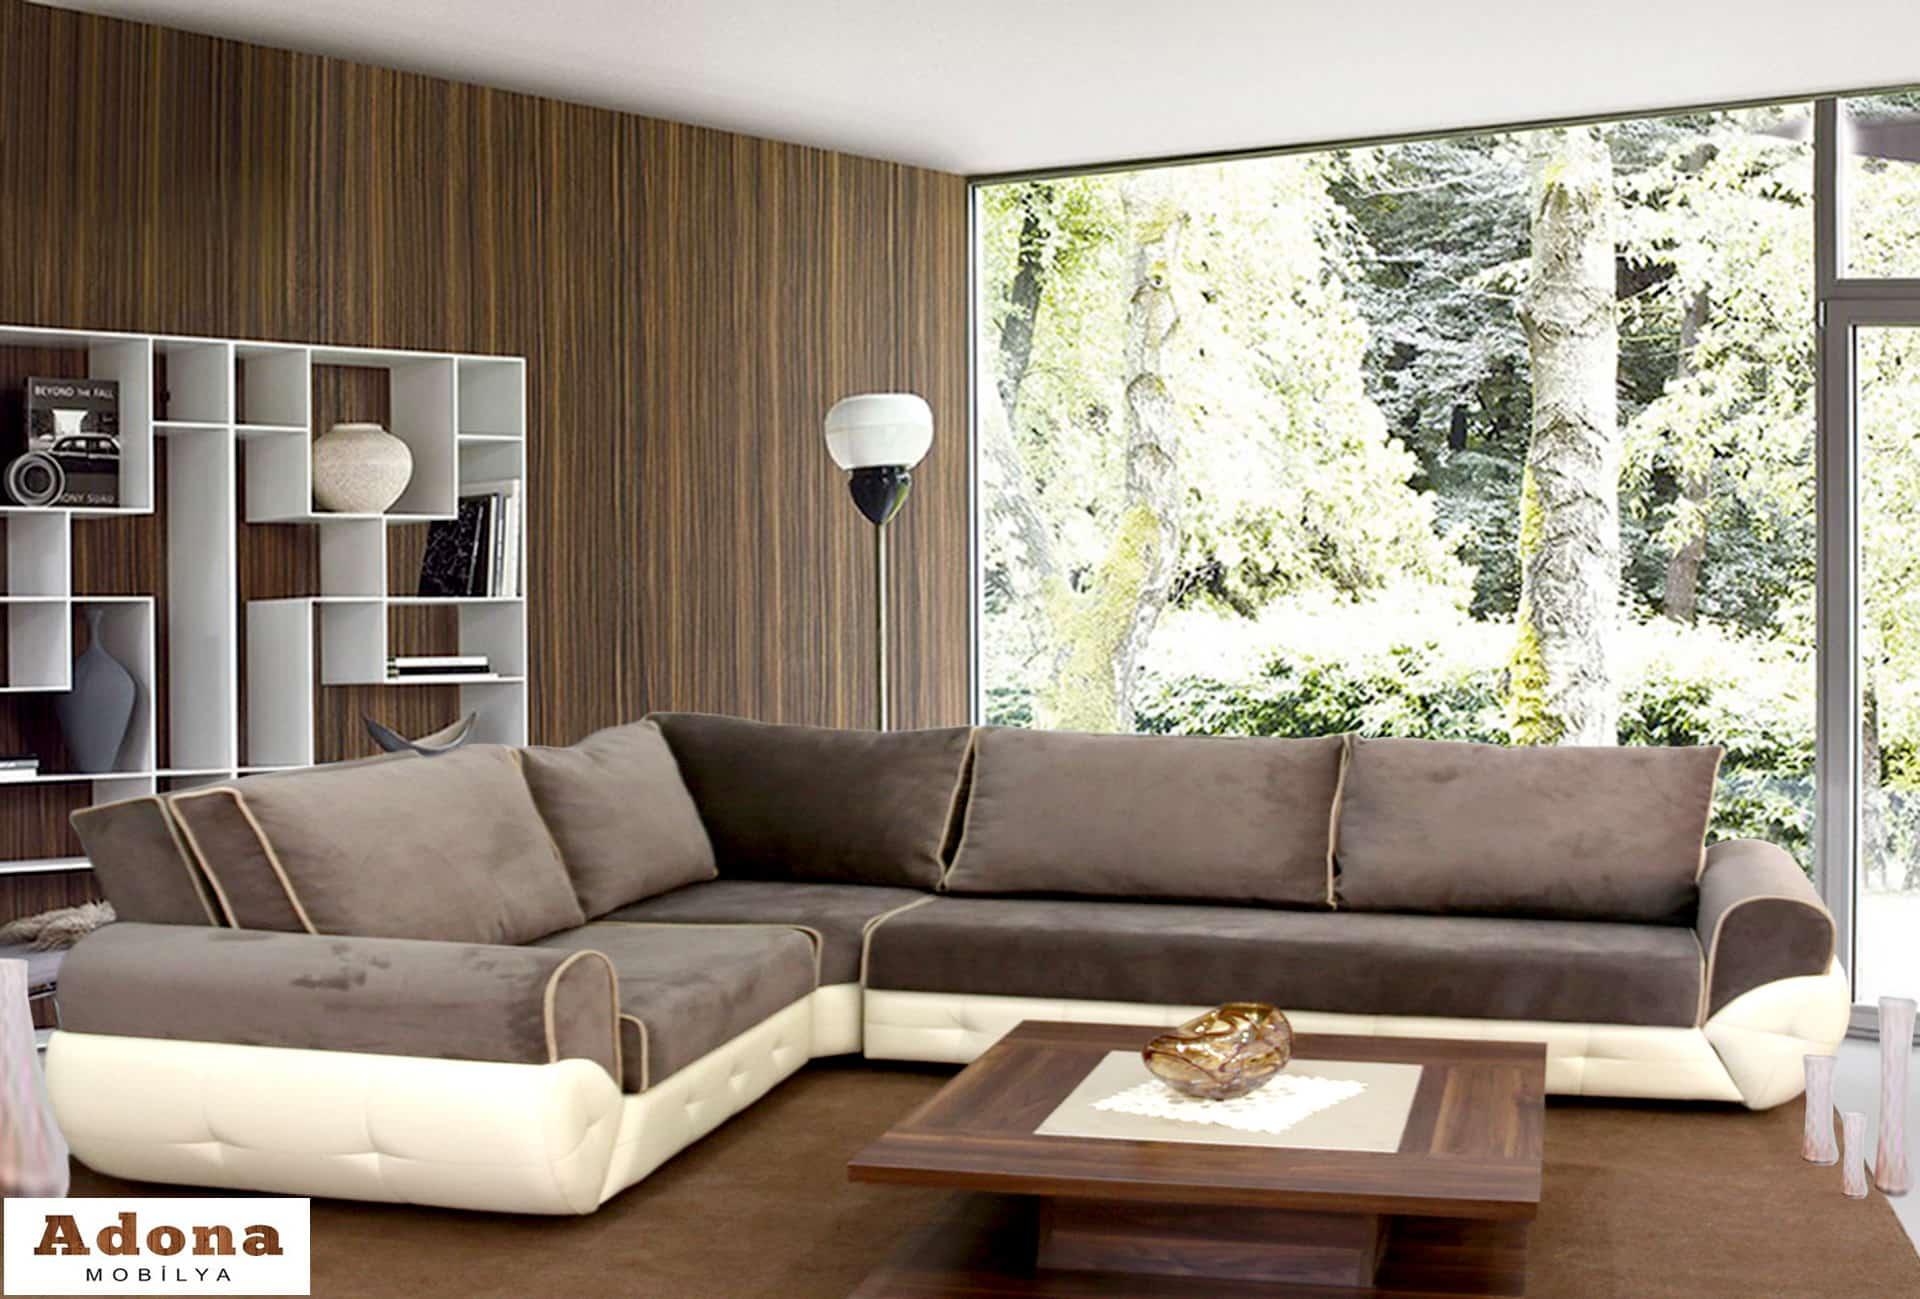 Adona mobilya-Künc Silvia